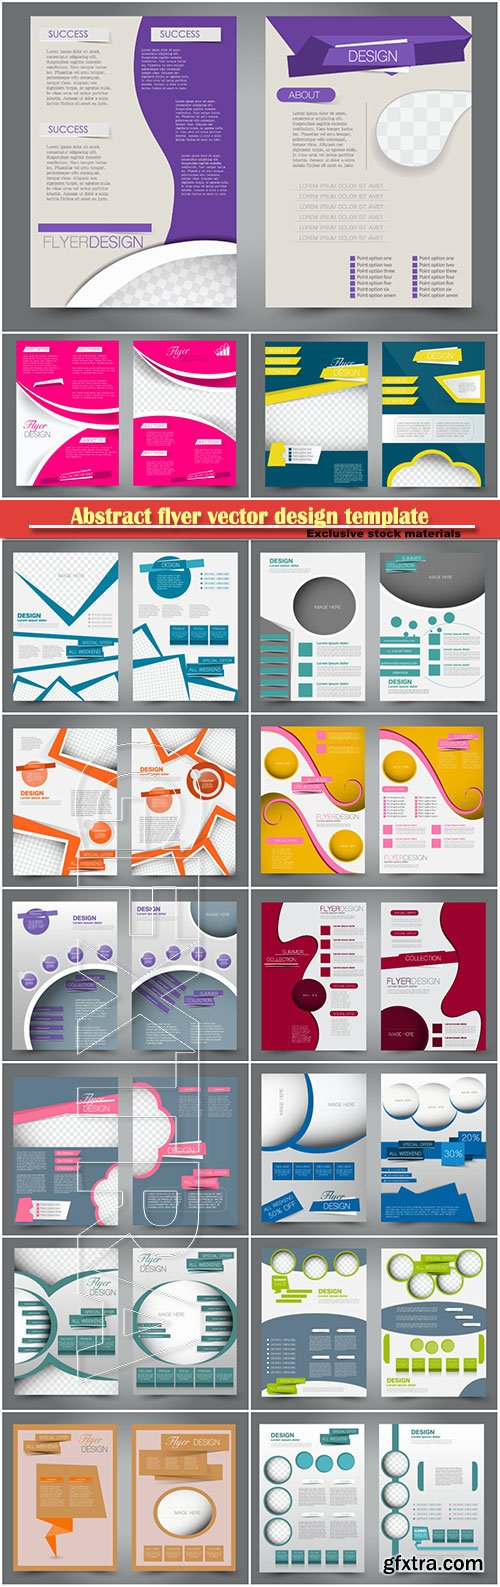 Abstract flyer vector design template, business brochure